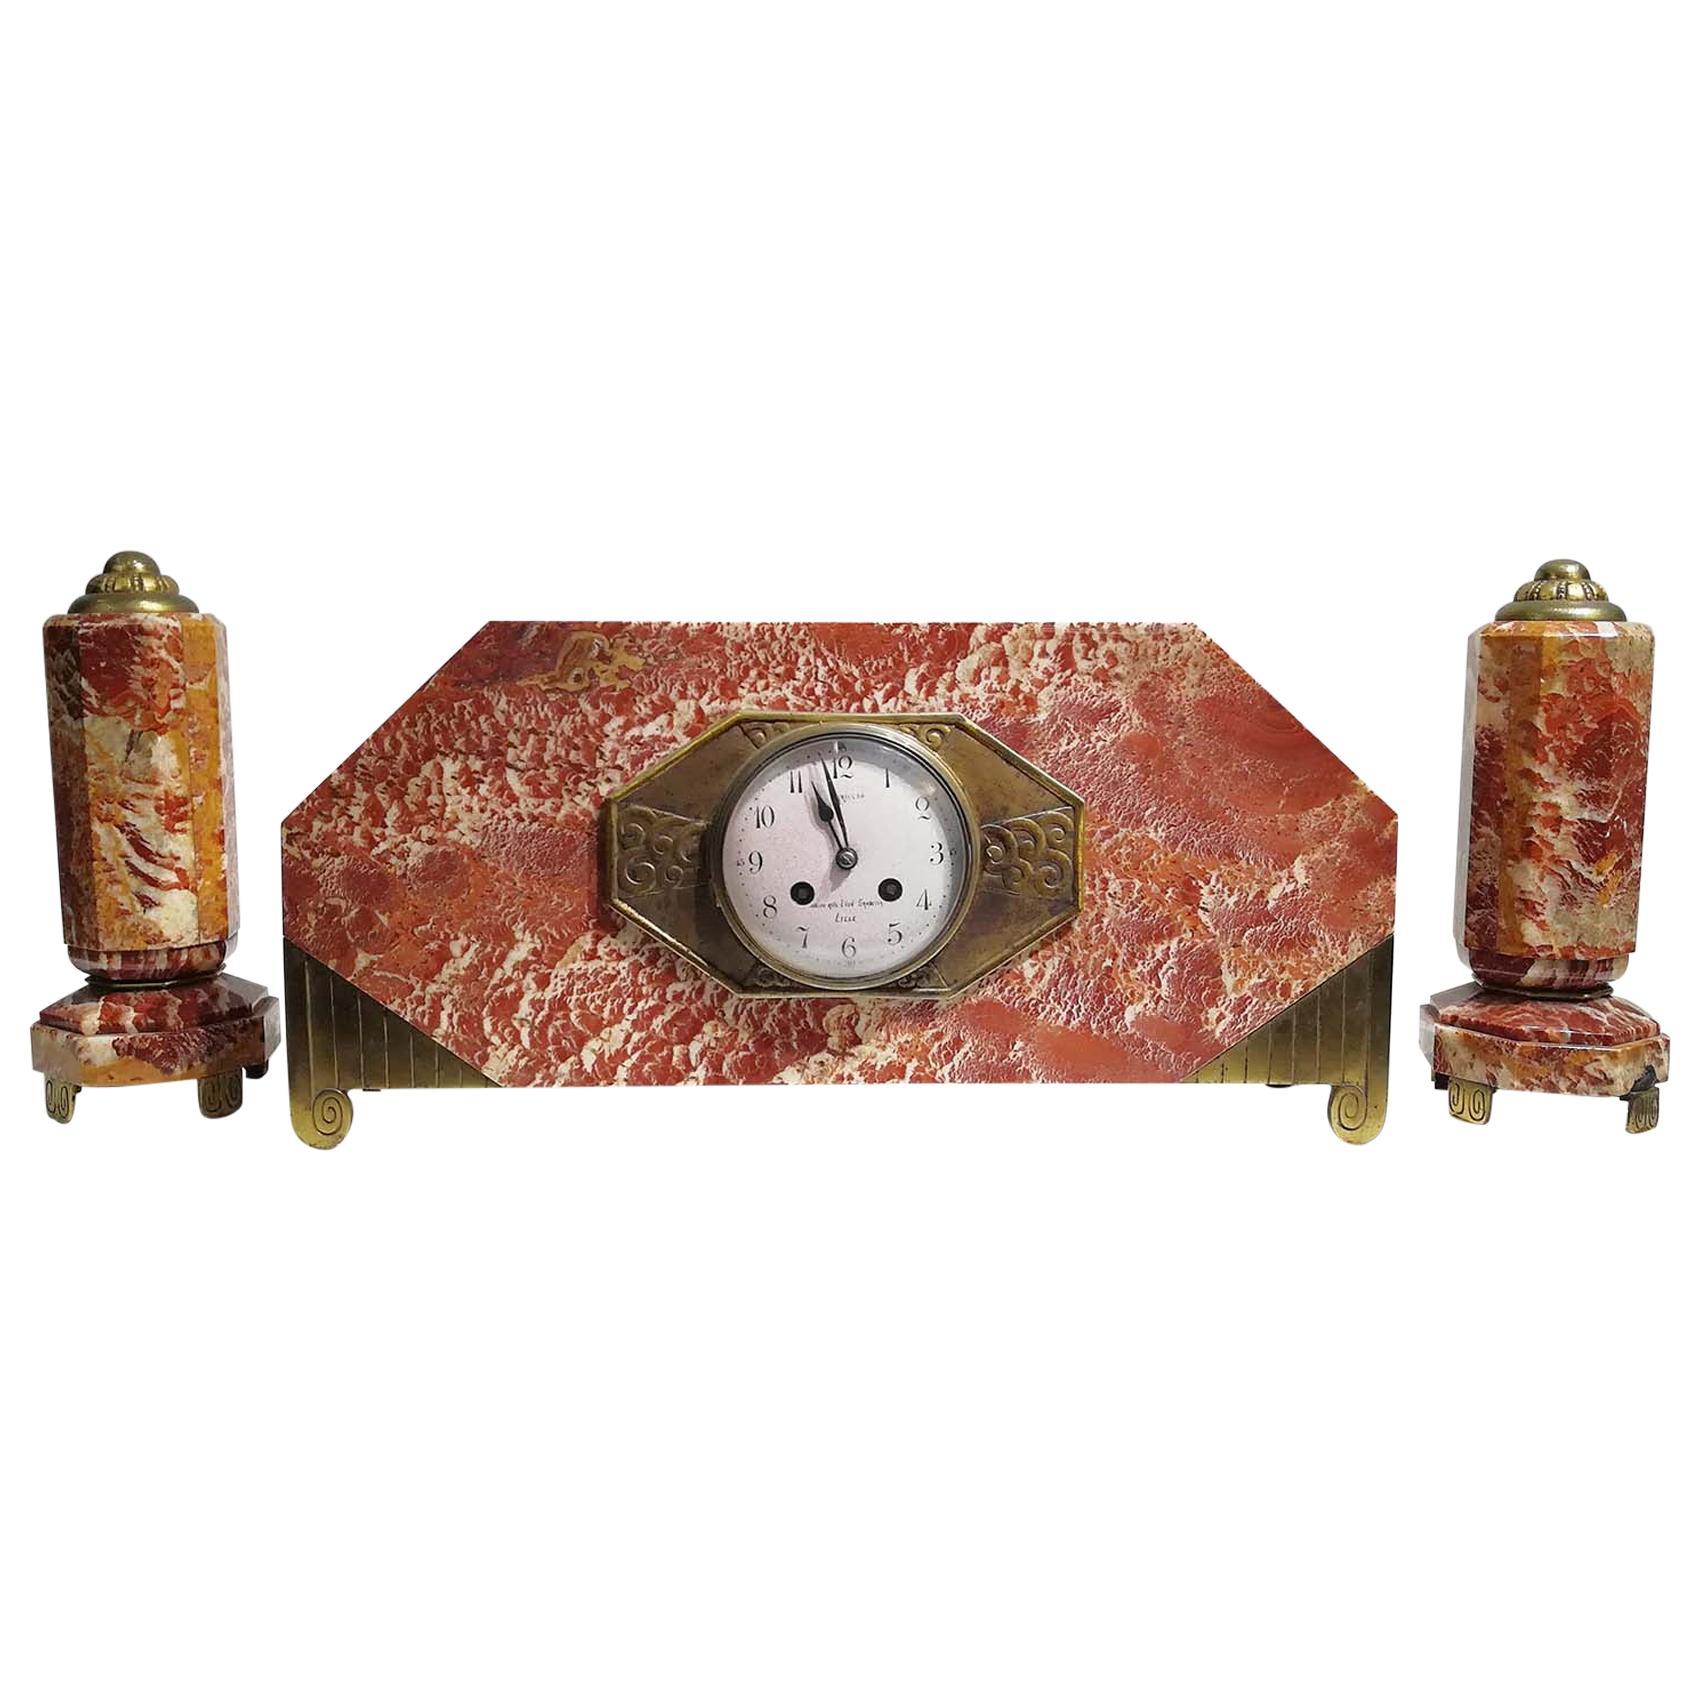 French Art Deco Mantel Clock Set Signed Bennet & Pottier Made in Paris, France